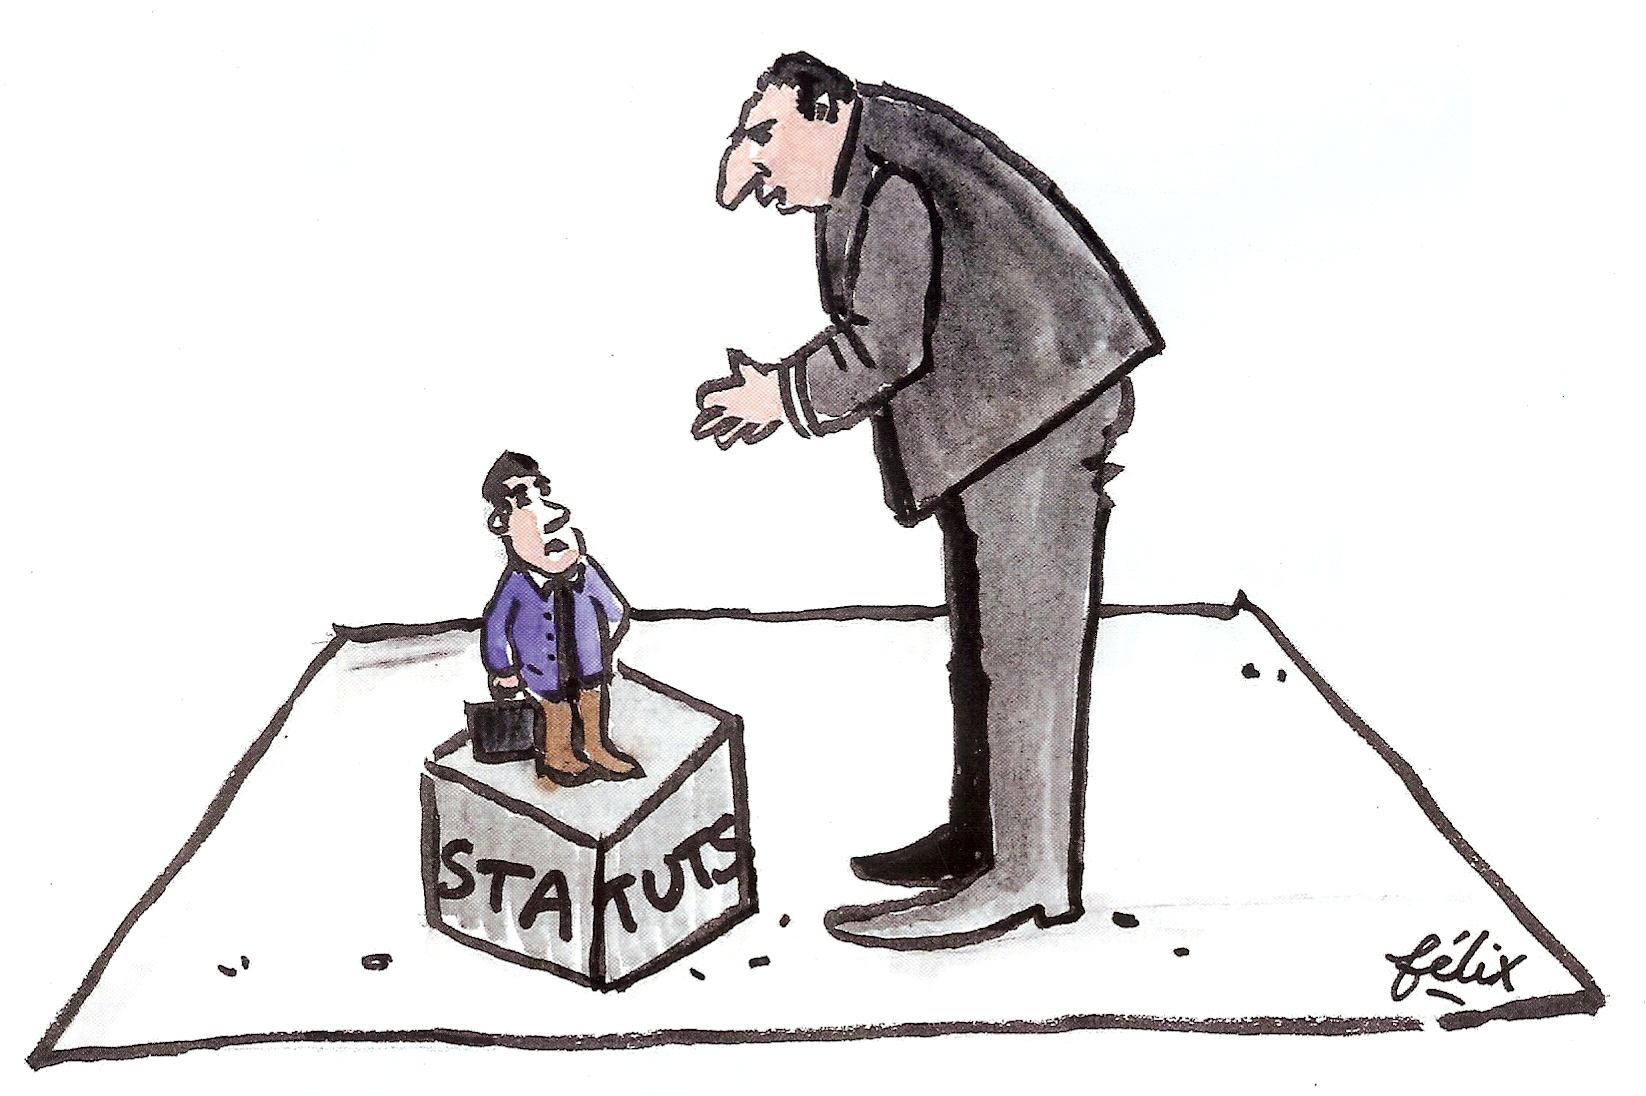 statuts30001